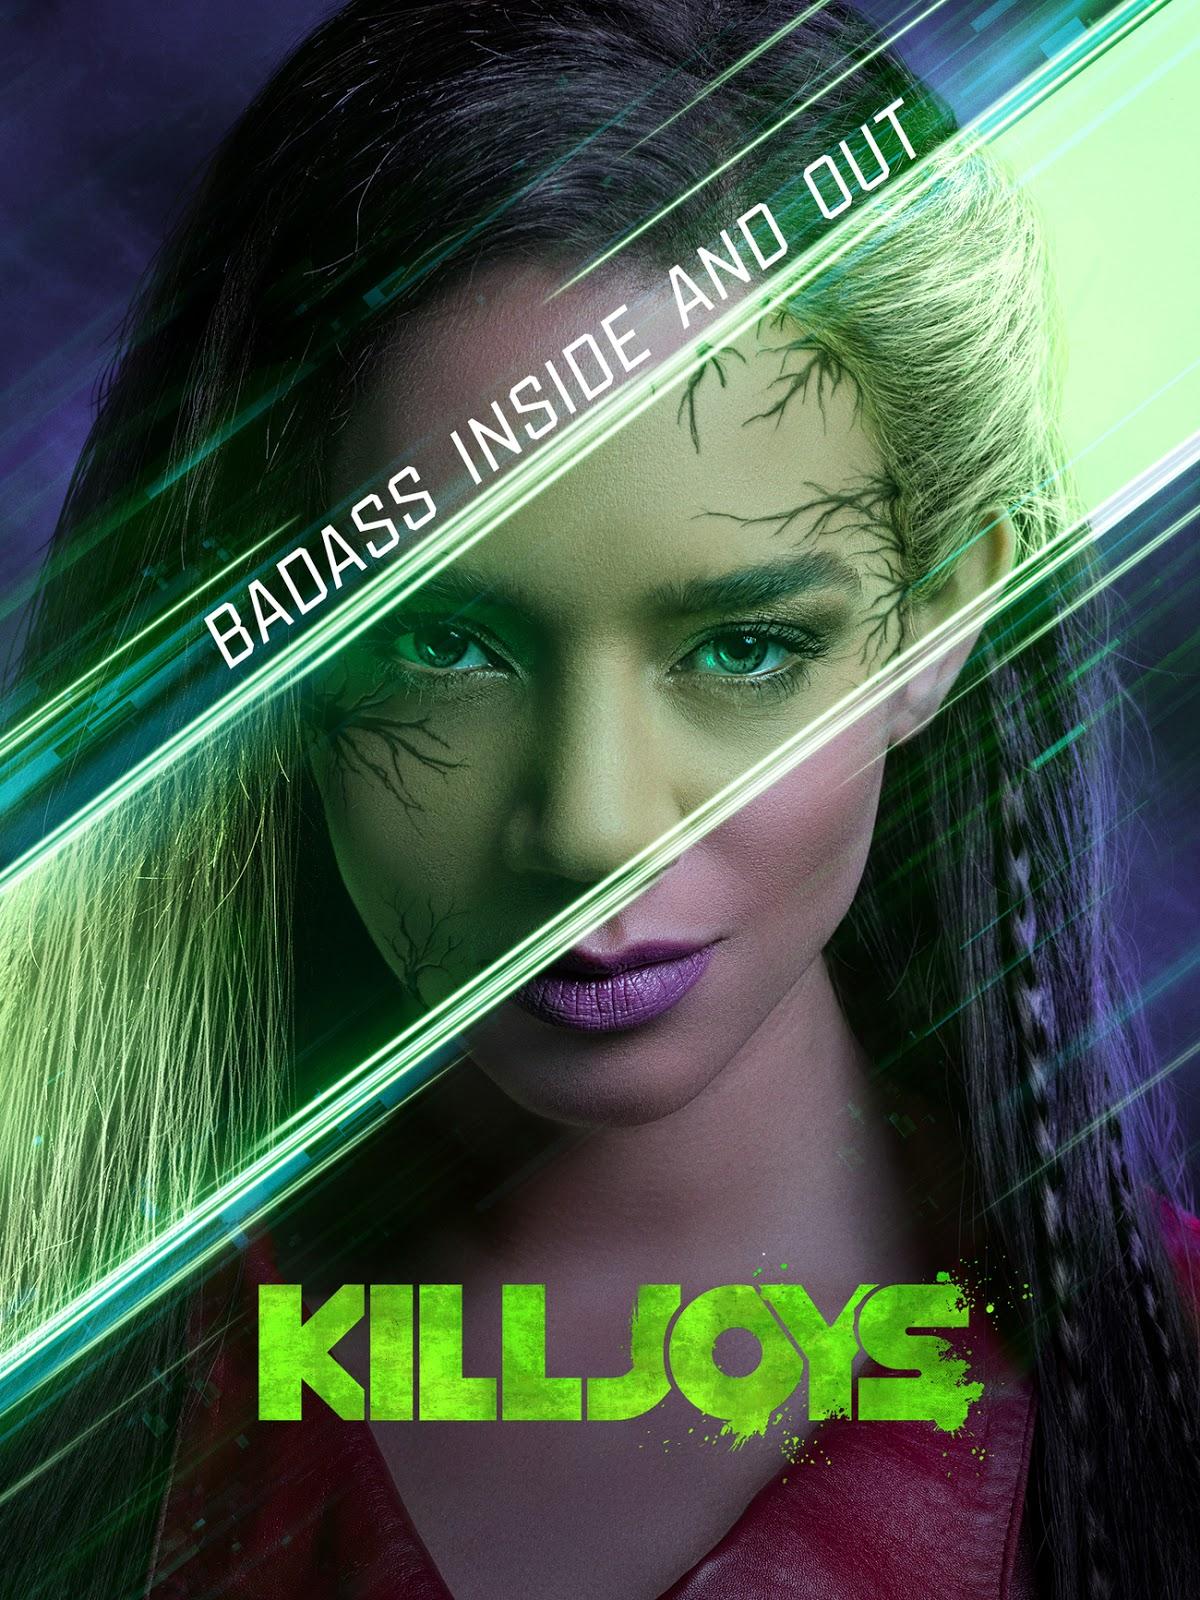 Killjoys 2018: Season 4 - Full (1/8)